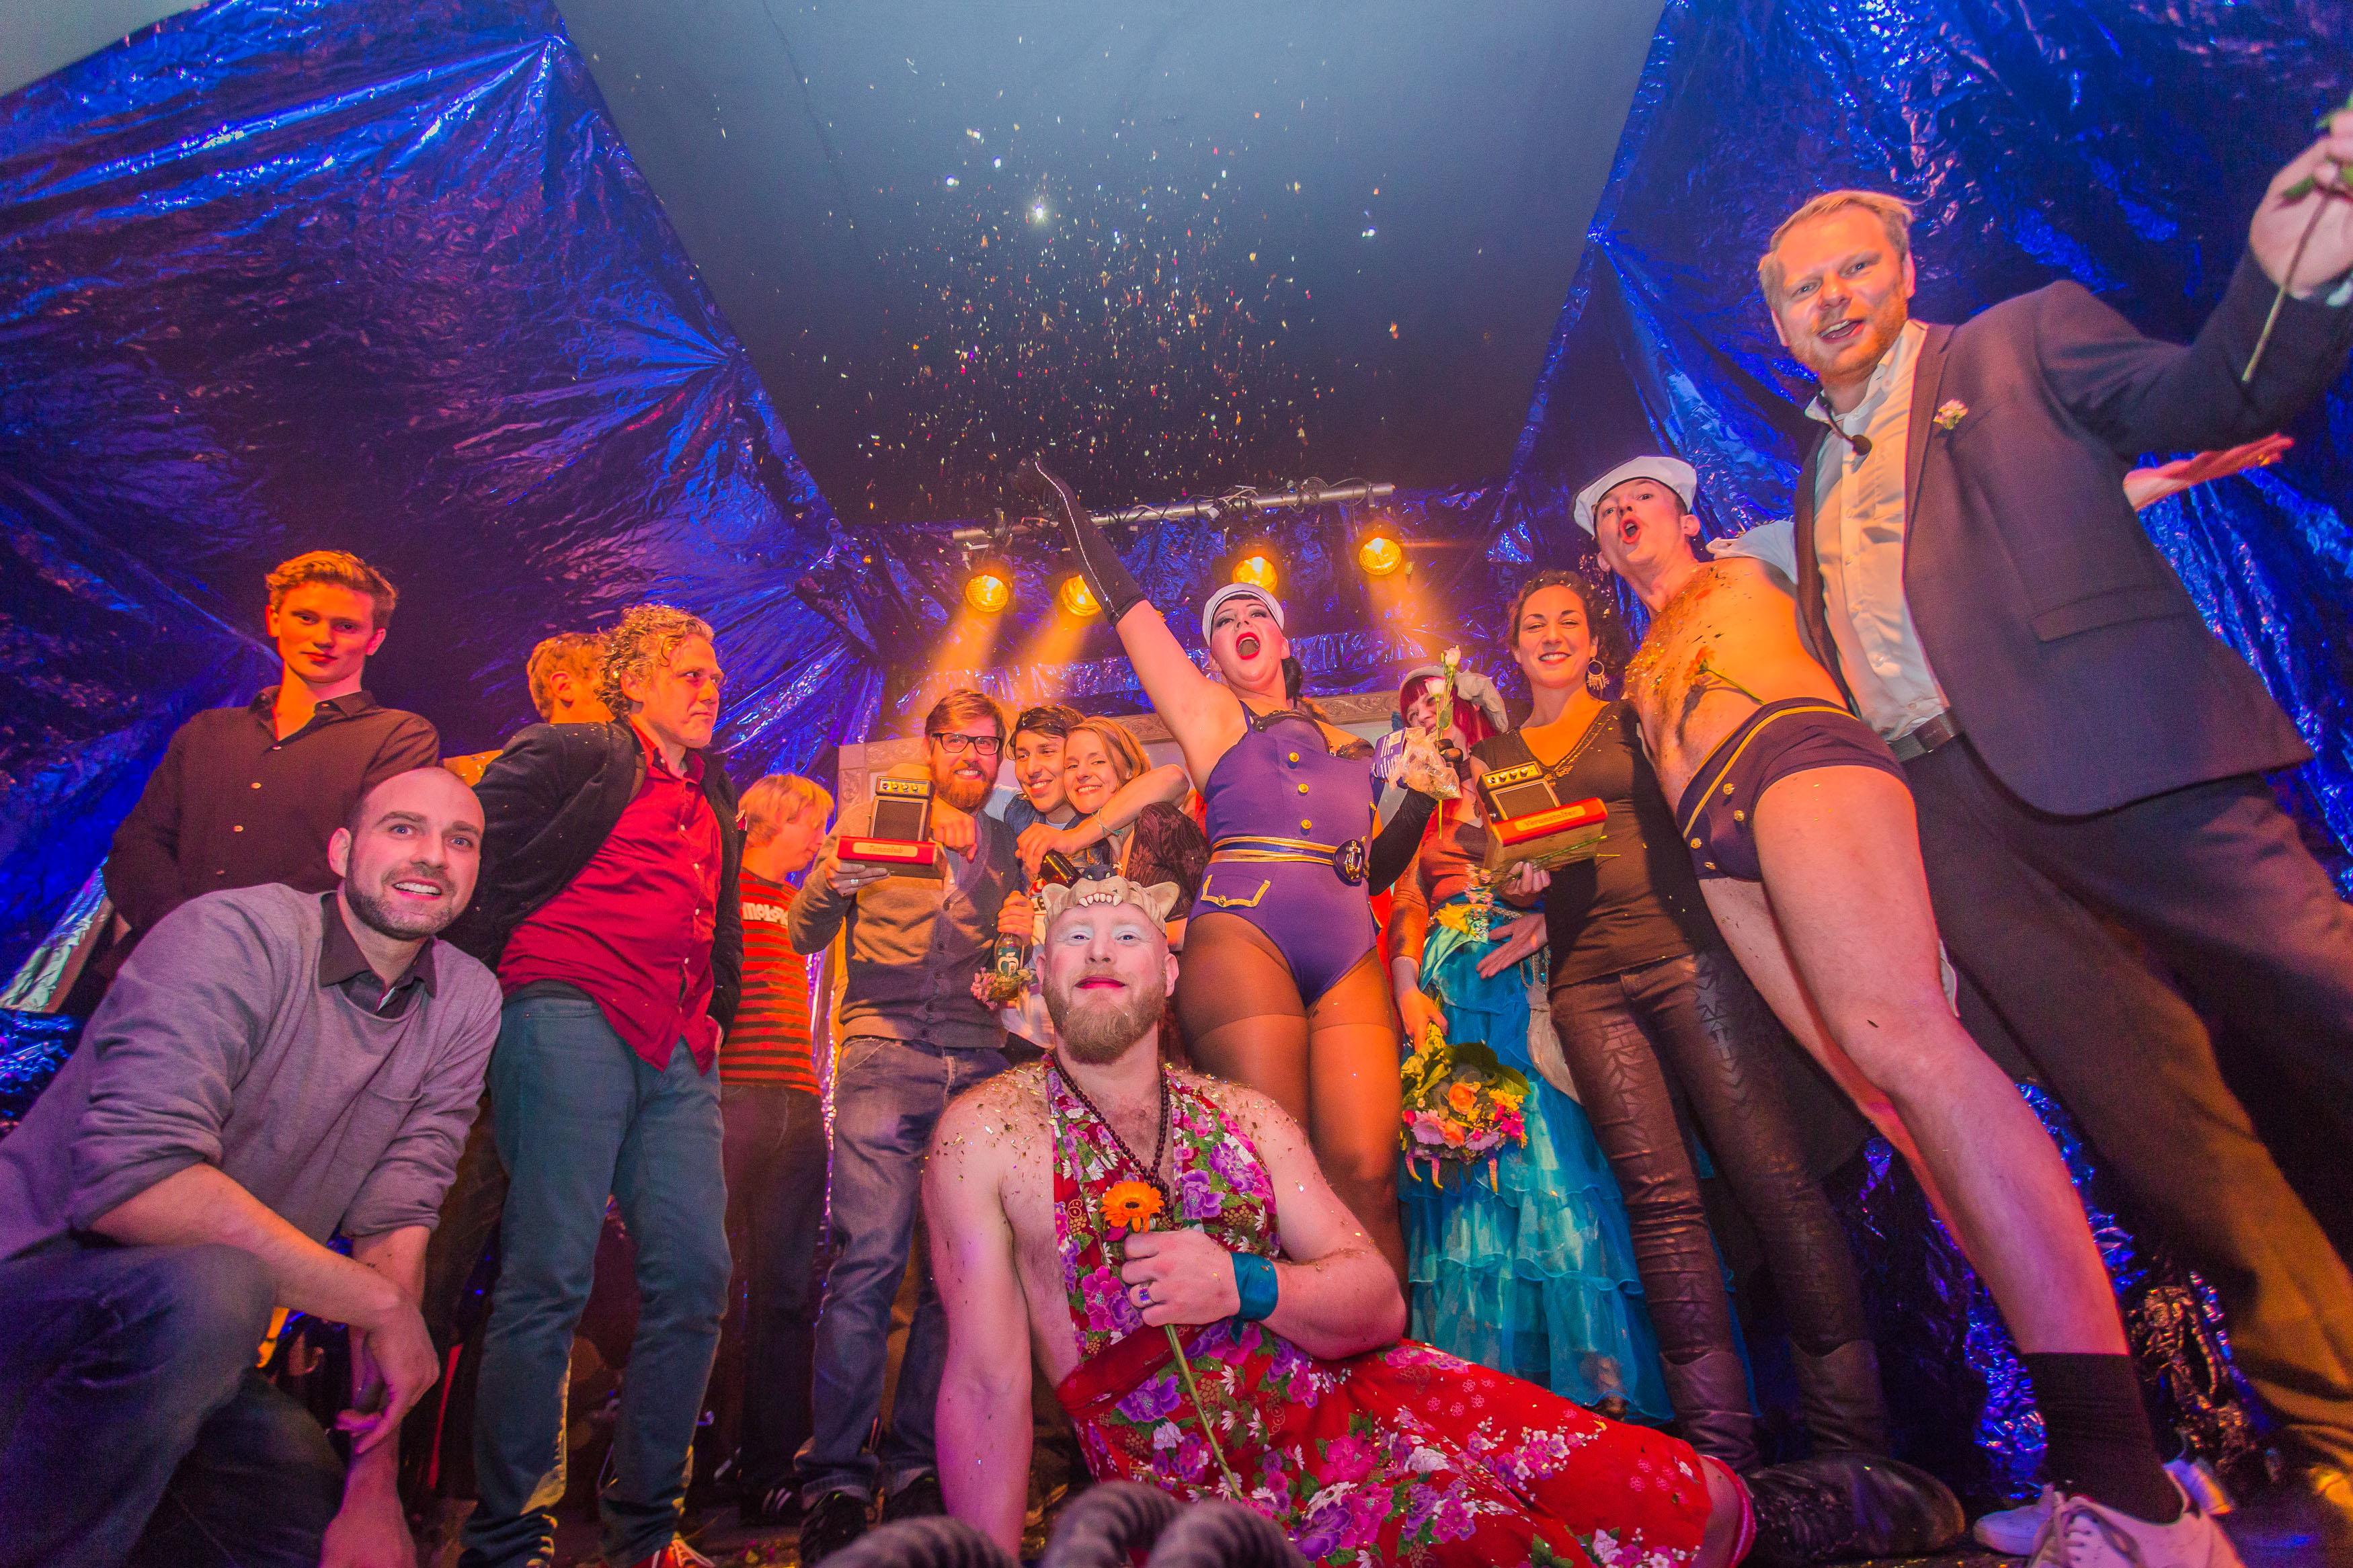 Club Award Preisverleihung 2014, Clubkombinat, Fundbureau Foto: Peter Eichelmann